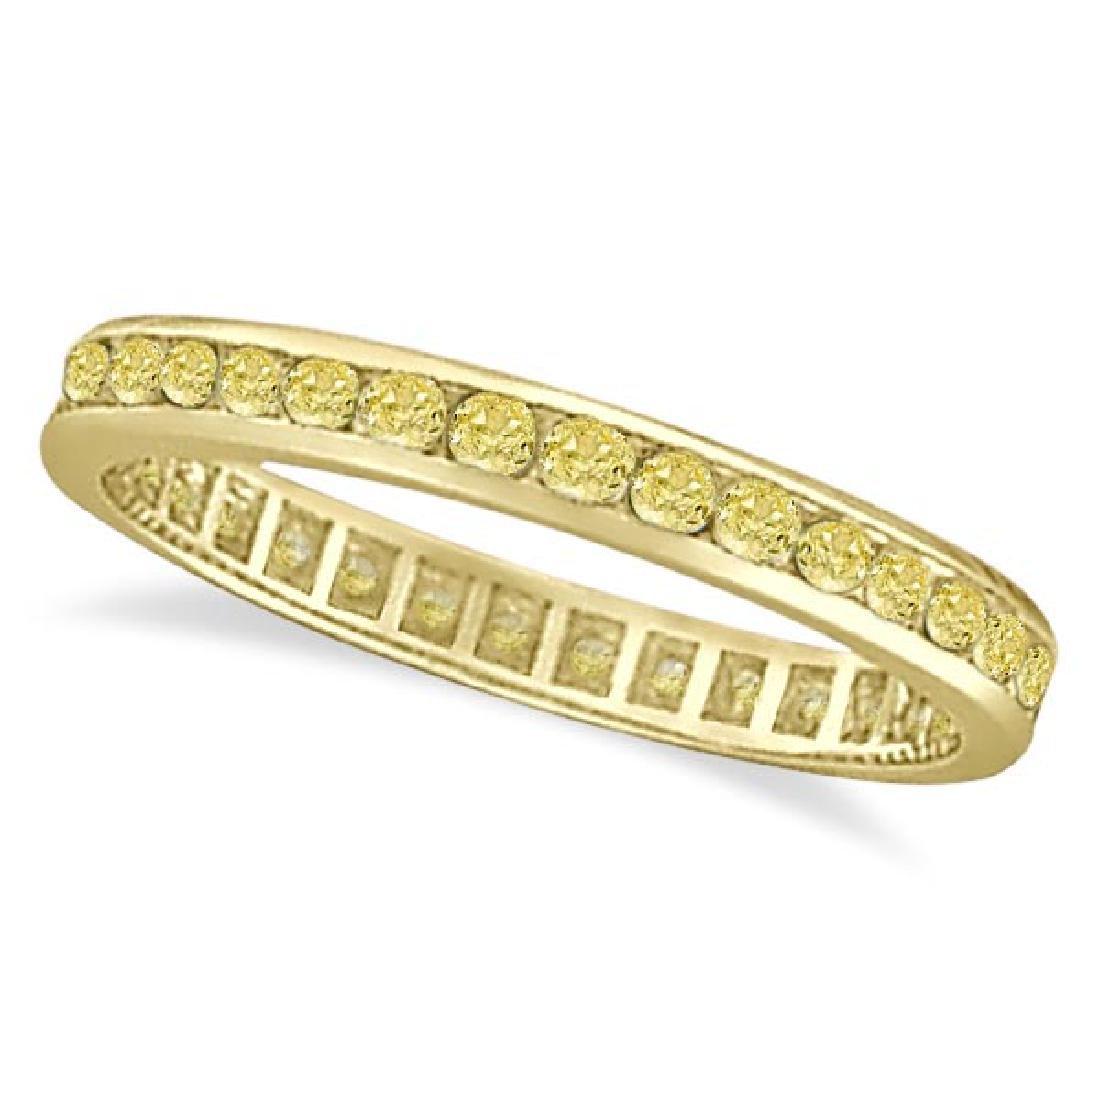 Channel Set Yellow Canary Diamond Eternity Ring 14k Yel